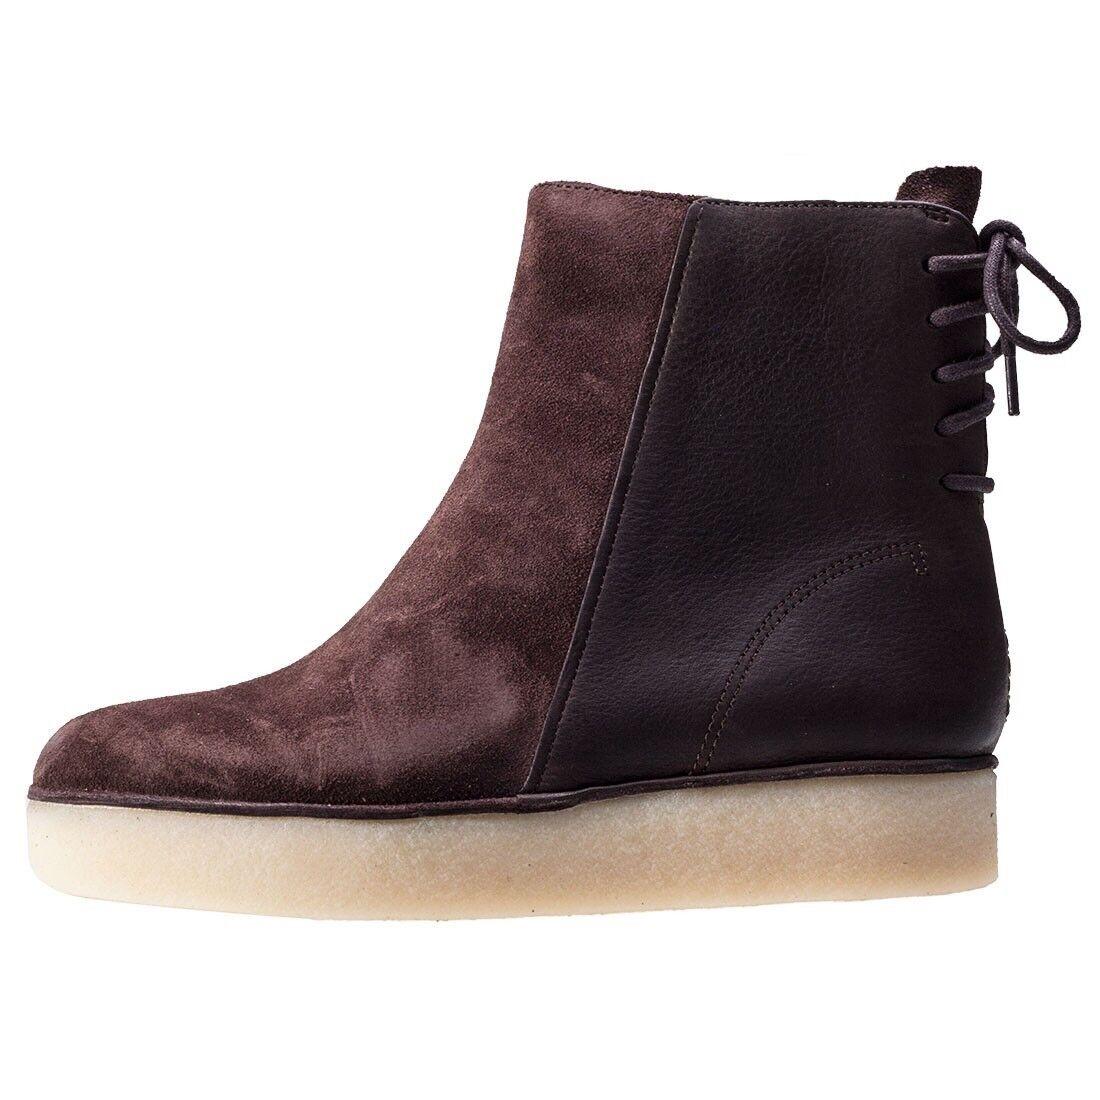 Clarks Originals Timberly Grace Khaki/Braun Größe Combi Suede Ankle Stiefel Größe Khaki/Braun 7 / 41 bd588e